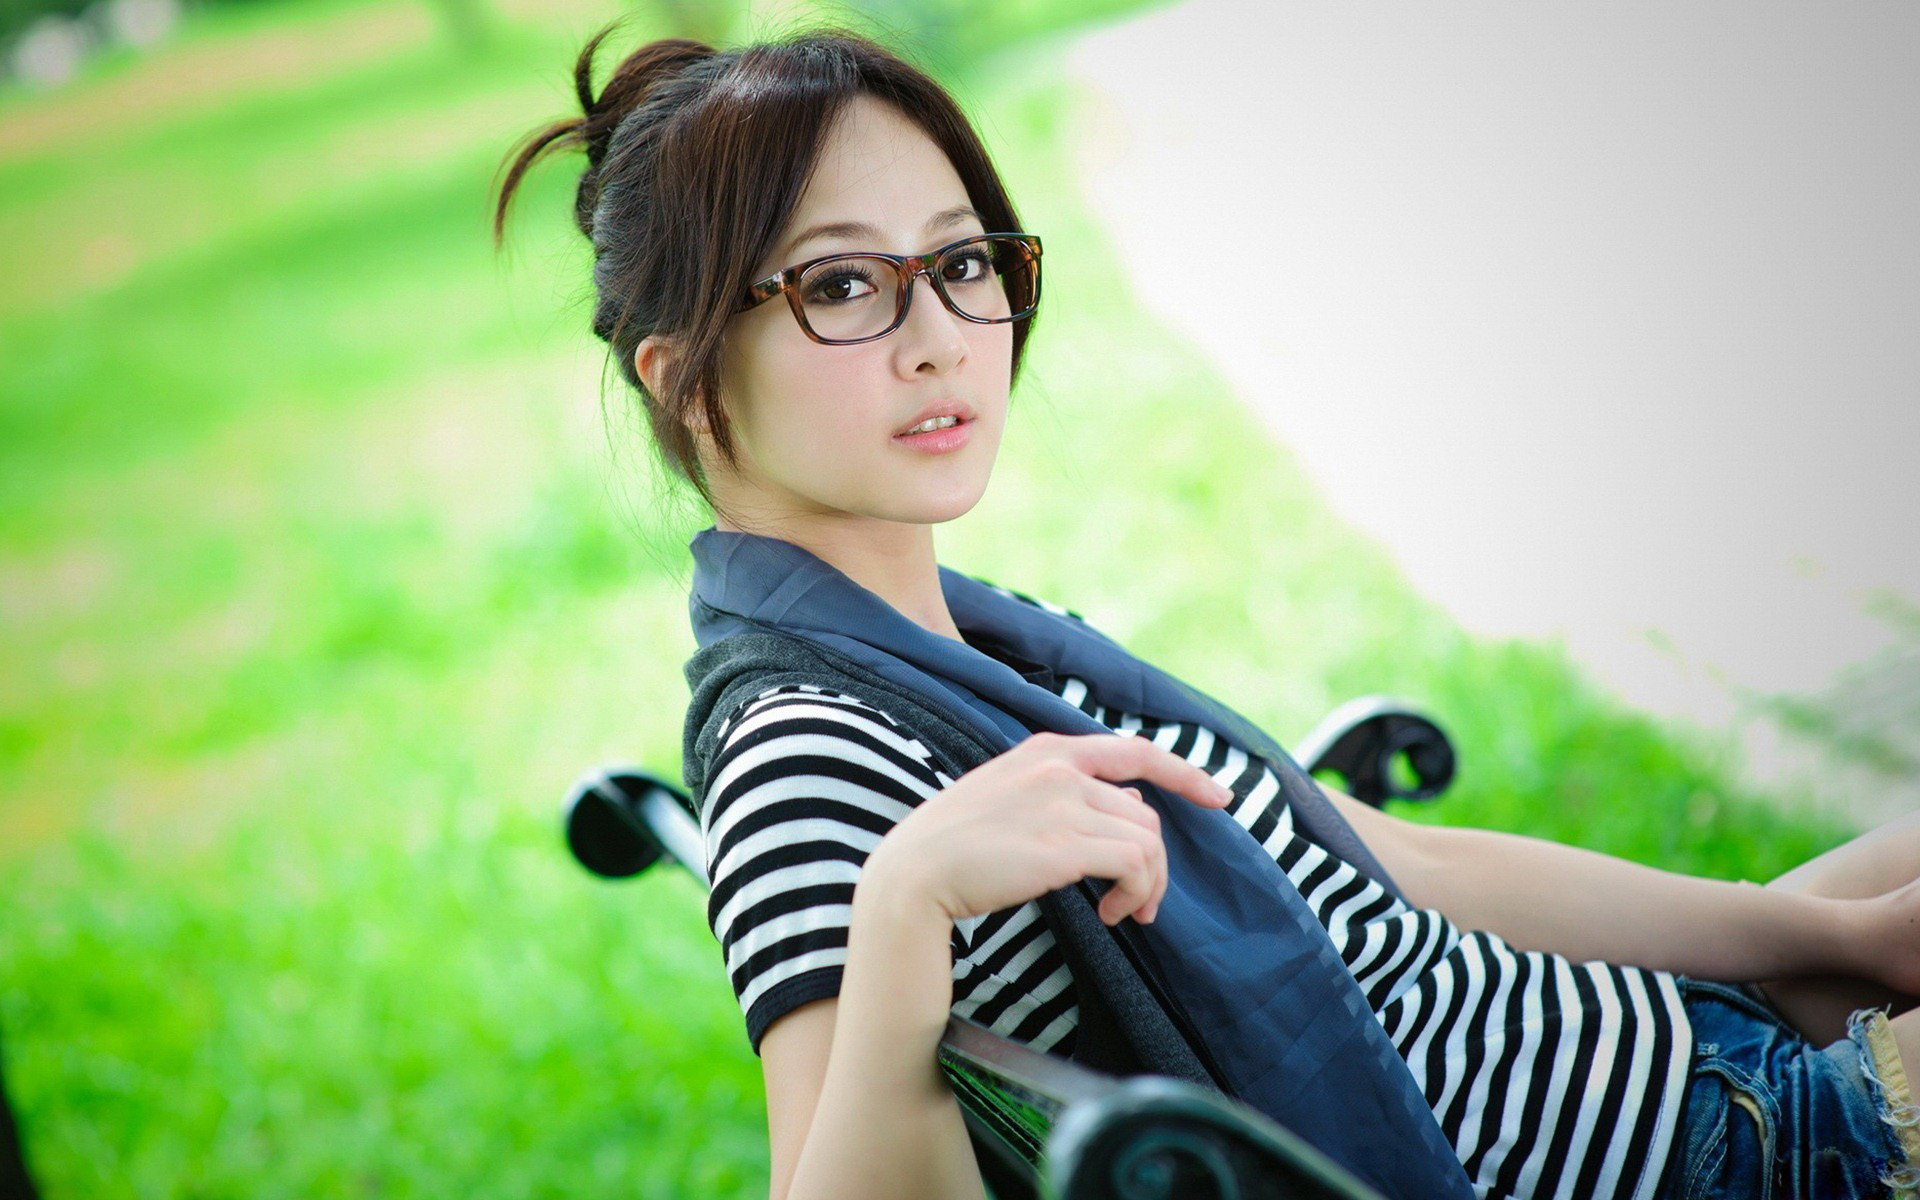 Beautiful Girl For Facebook Girls Hd Hd Images Hd Photos Hd Pics